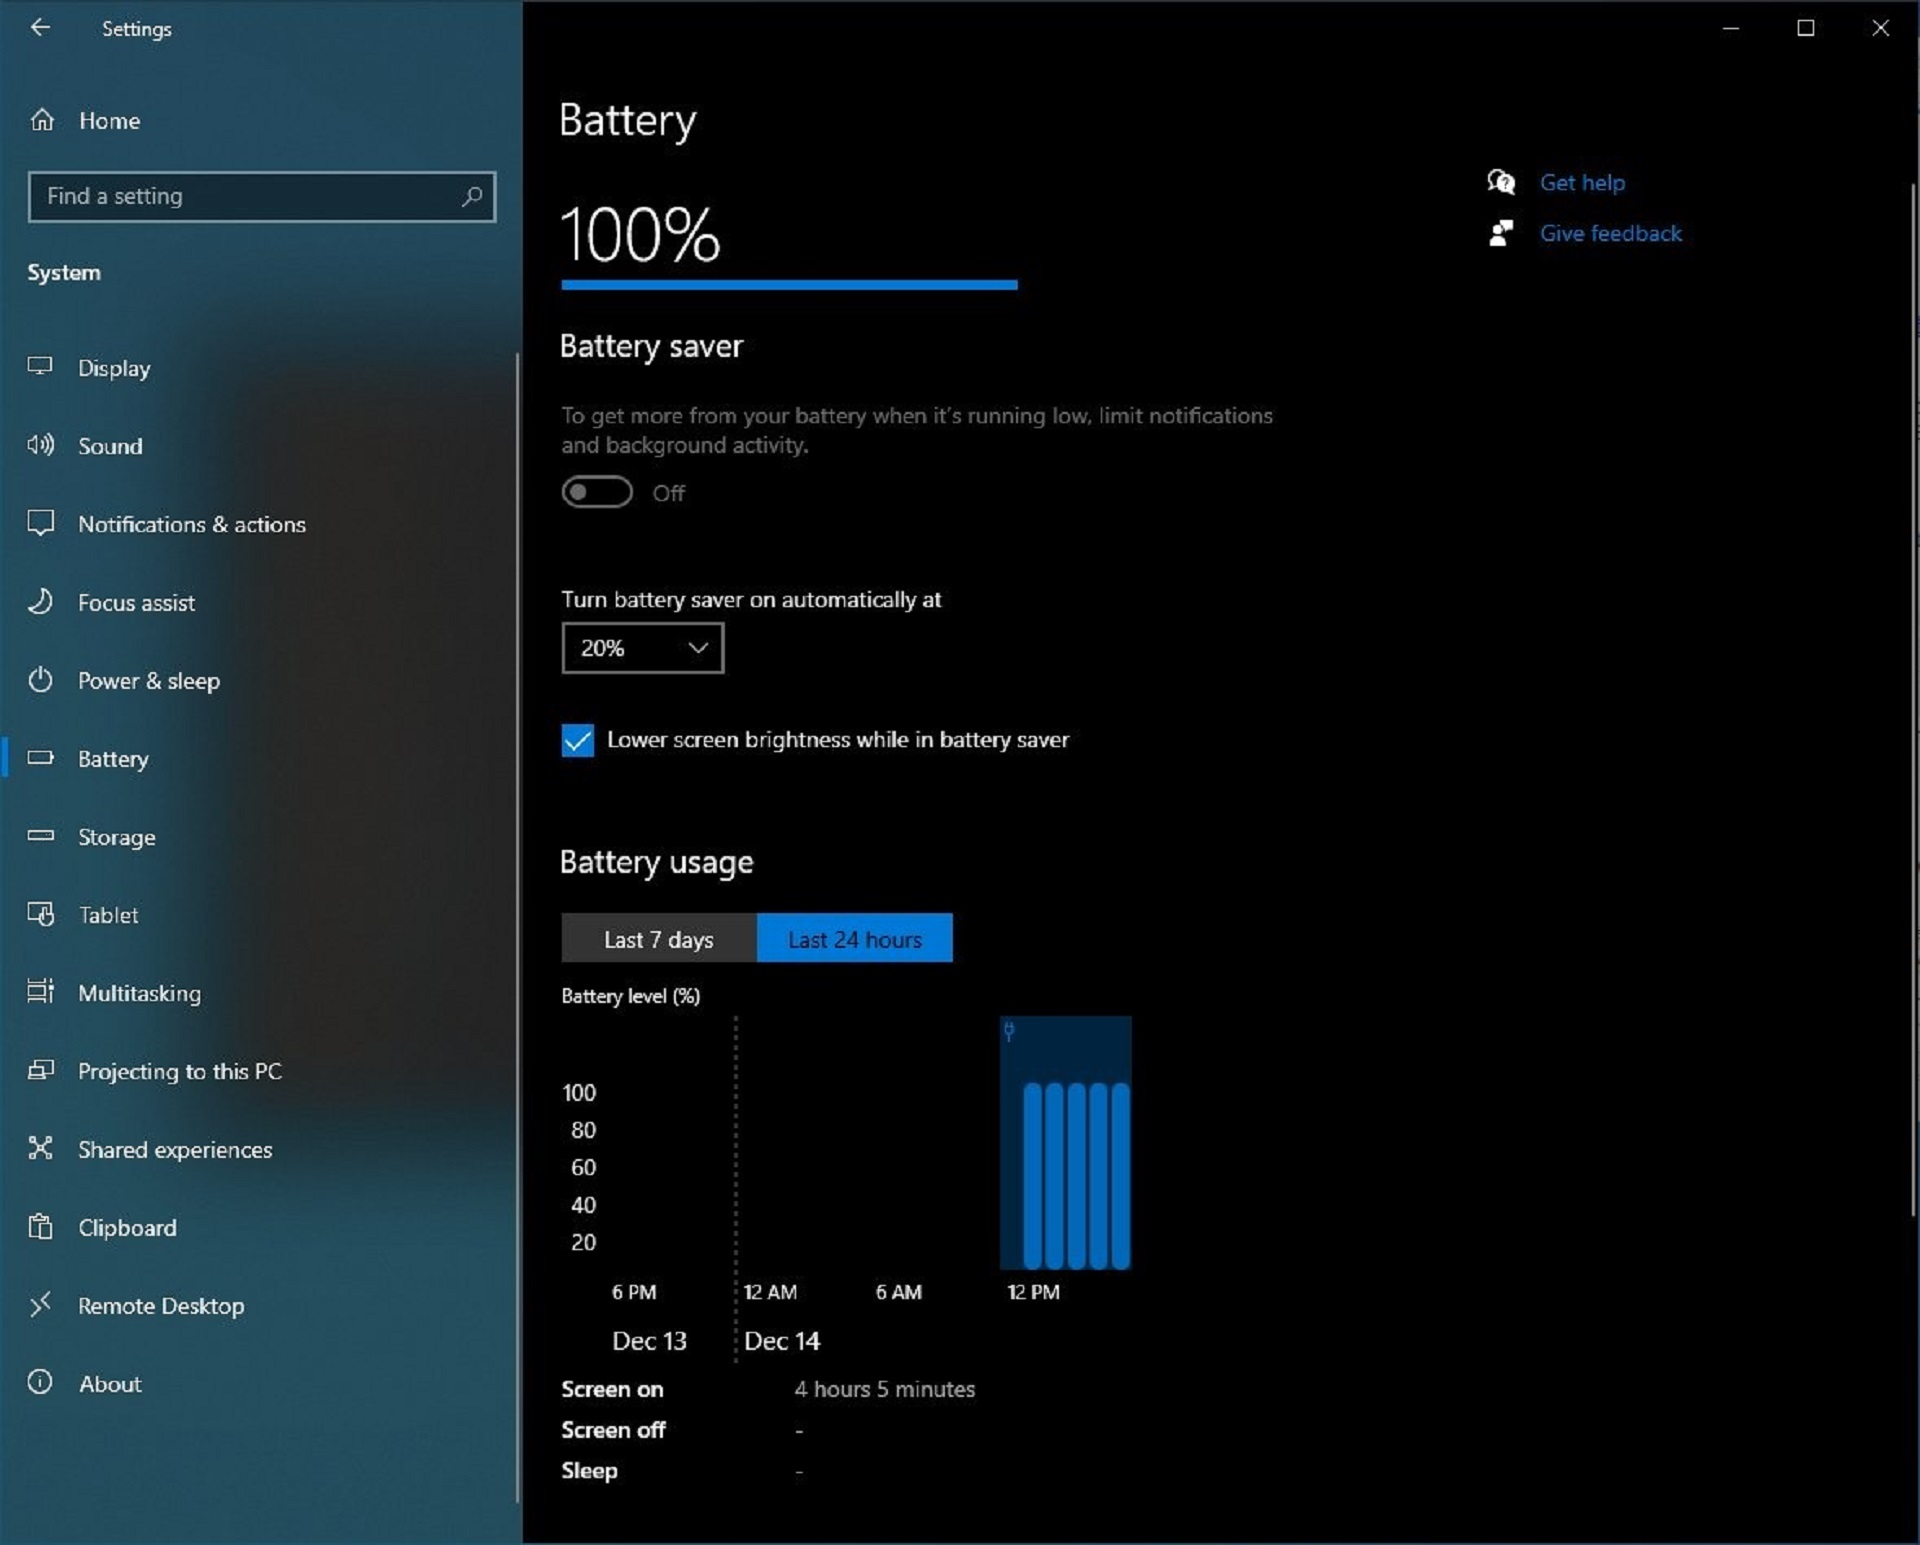 battery-usage-settingsc3add62a0c6ec6a19d41241e7713bde2-jpg.12820